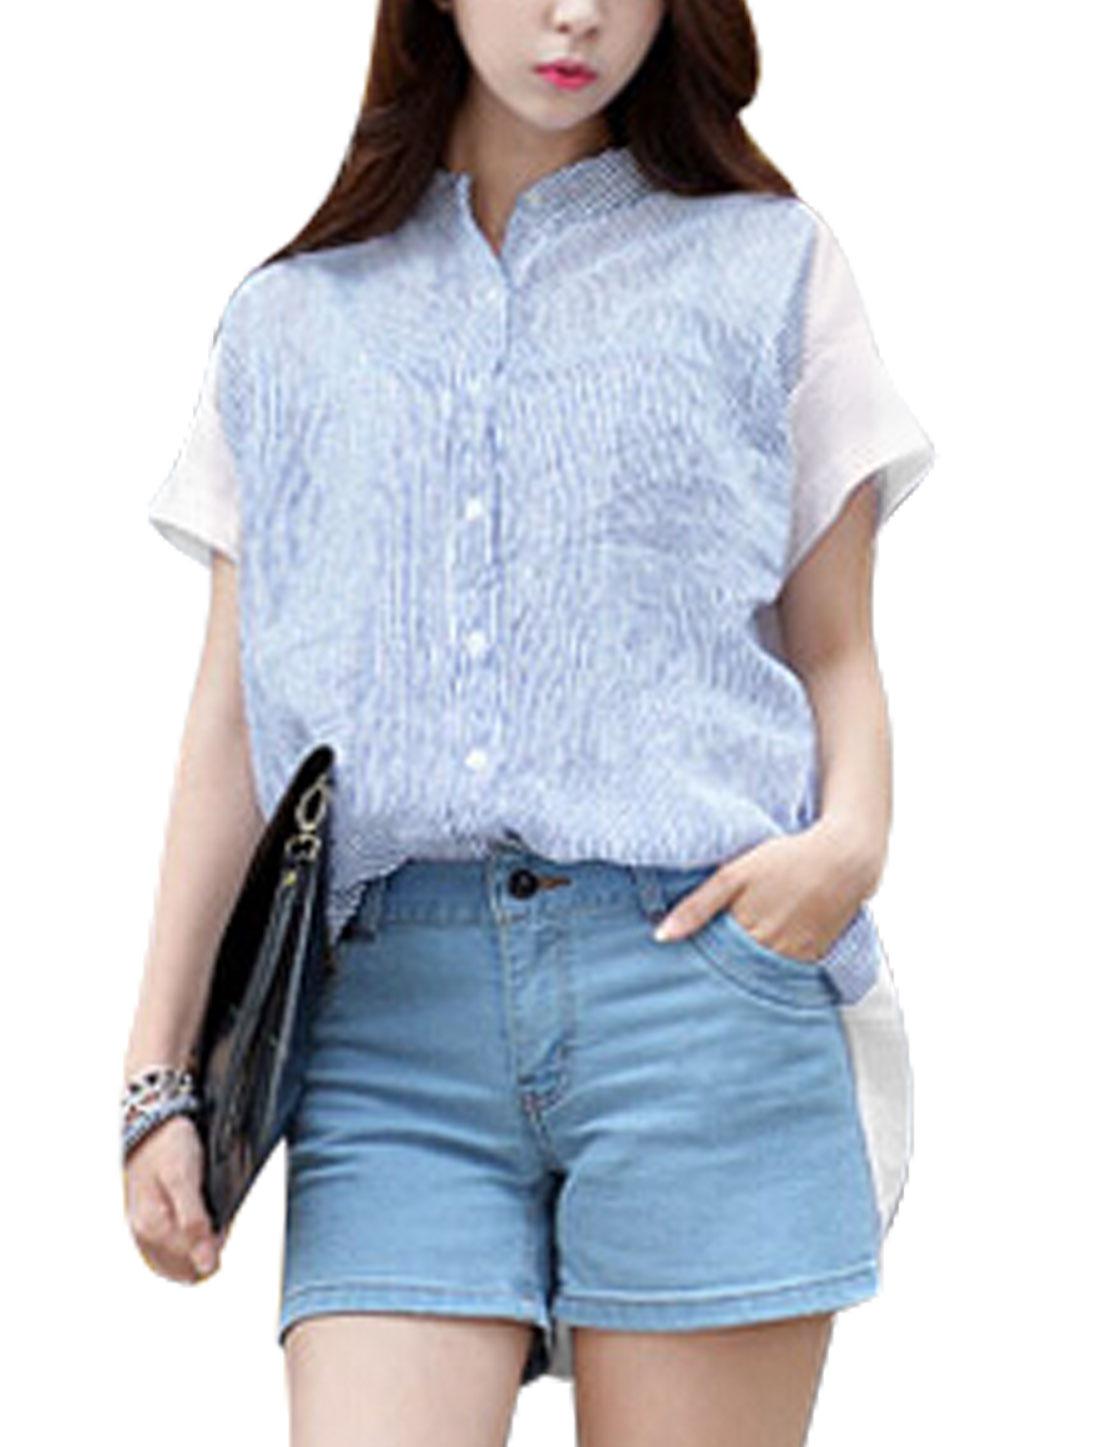 Ladies Button Up Stripes Panel Asymmetric Hem AShirt Sky Blue White XS